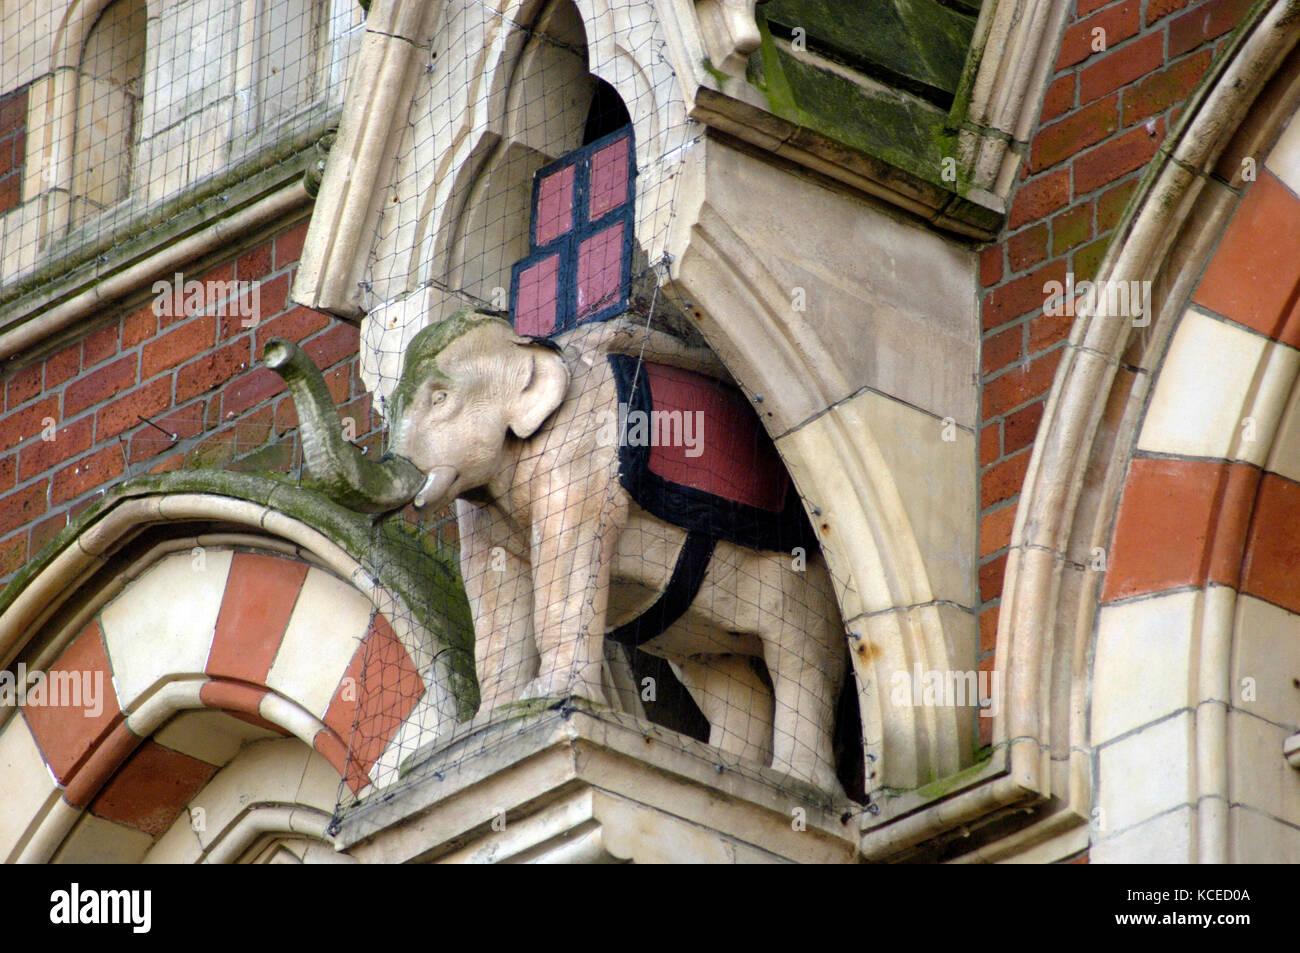 Elephant Tea Rooms, 64 - 66 Fawcett Street, Sunderland. Elephant in niche. - Stock Image